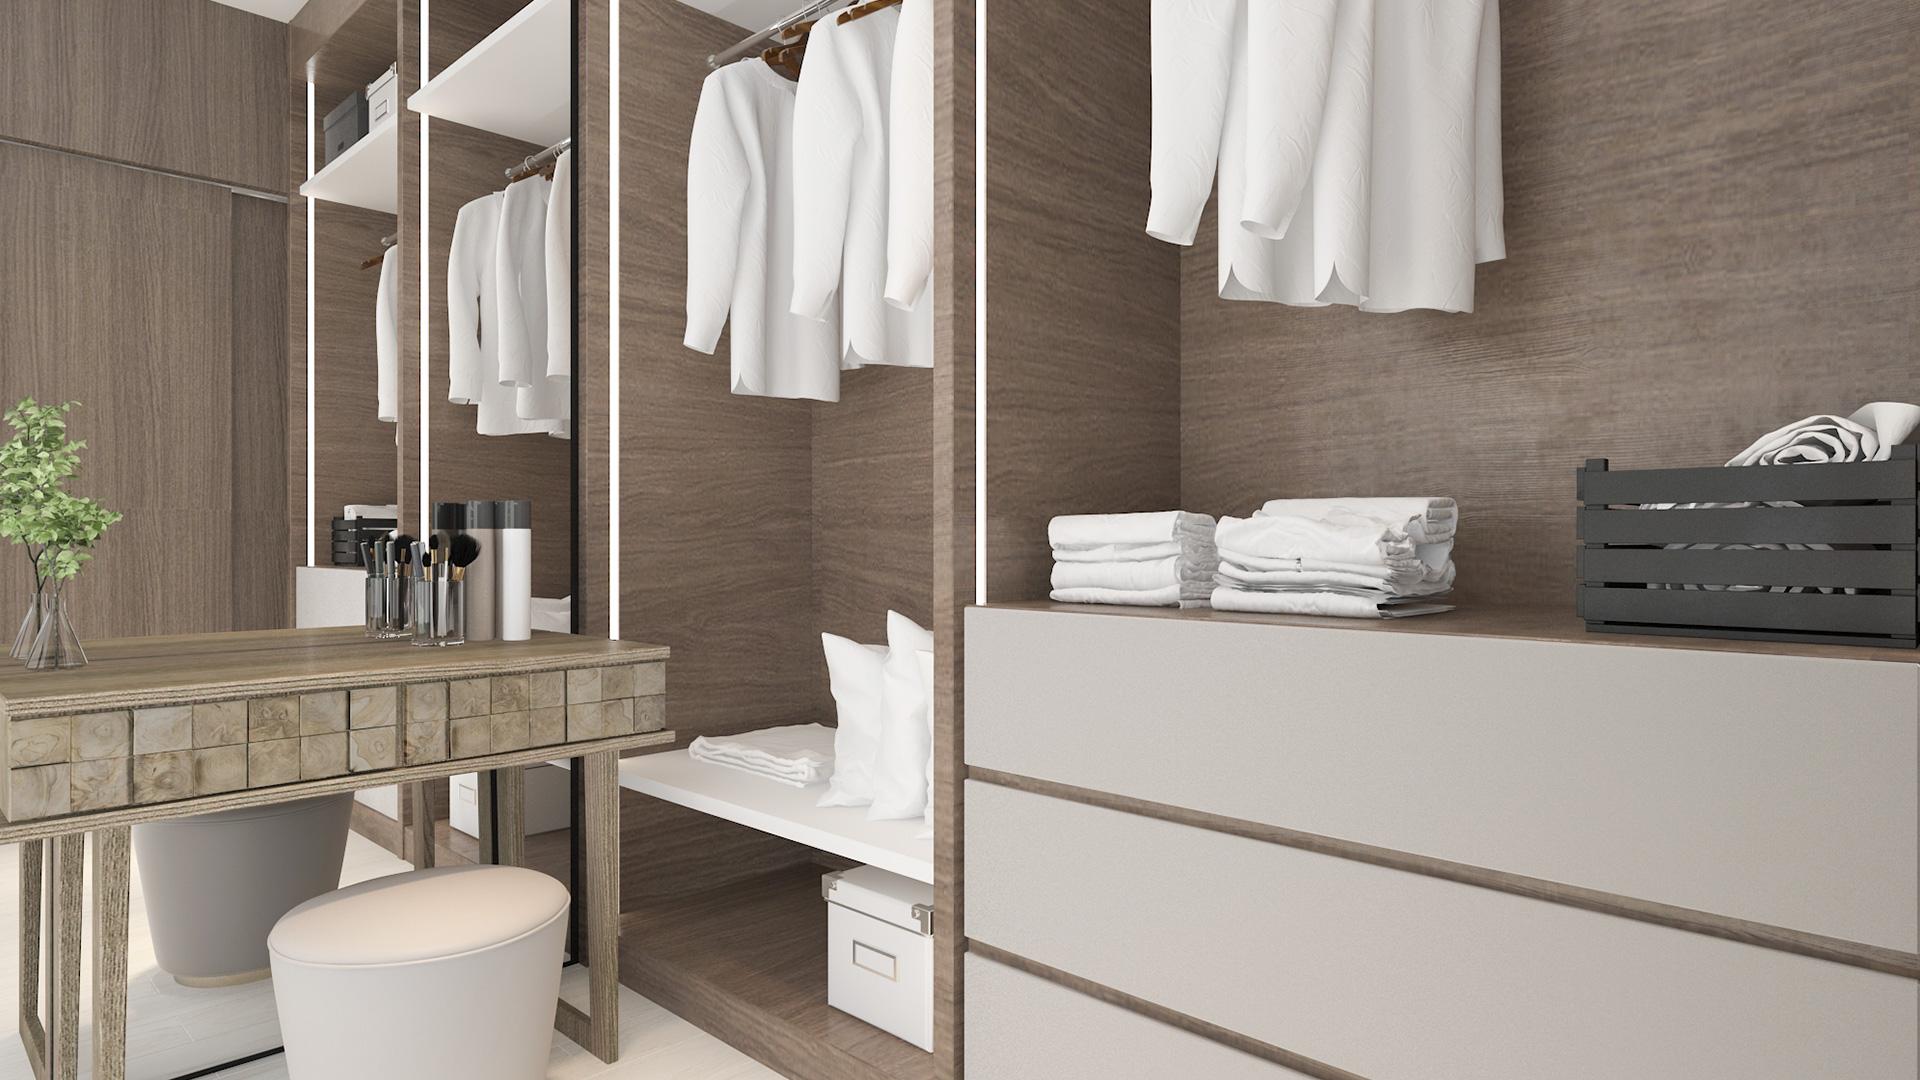 AlfaBangsar-apartment-wardrobe-01